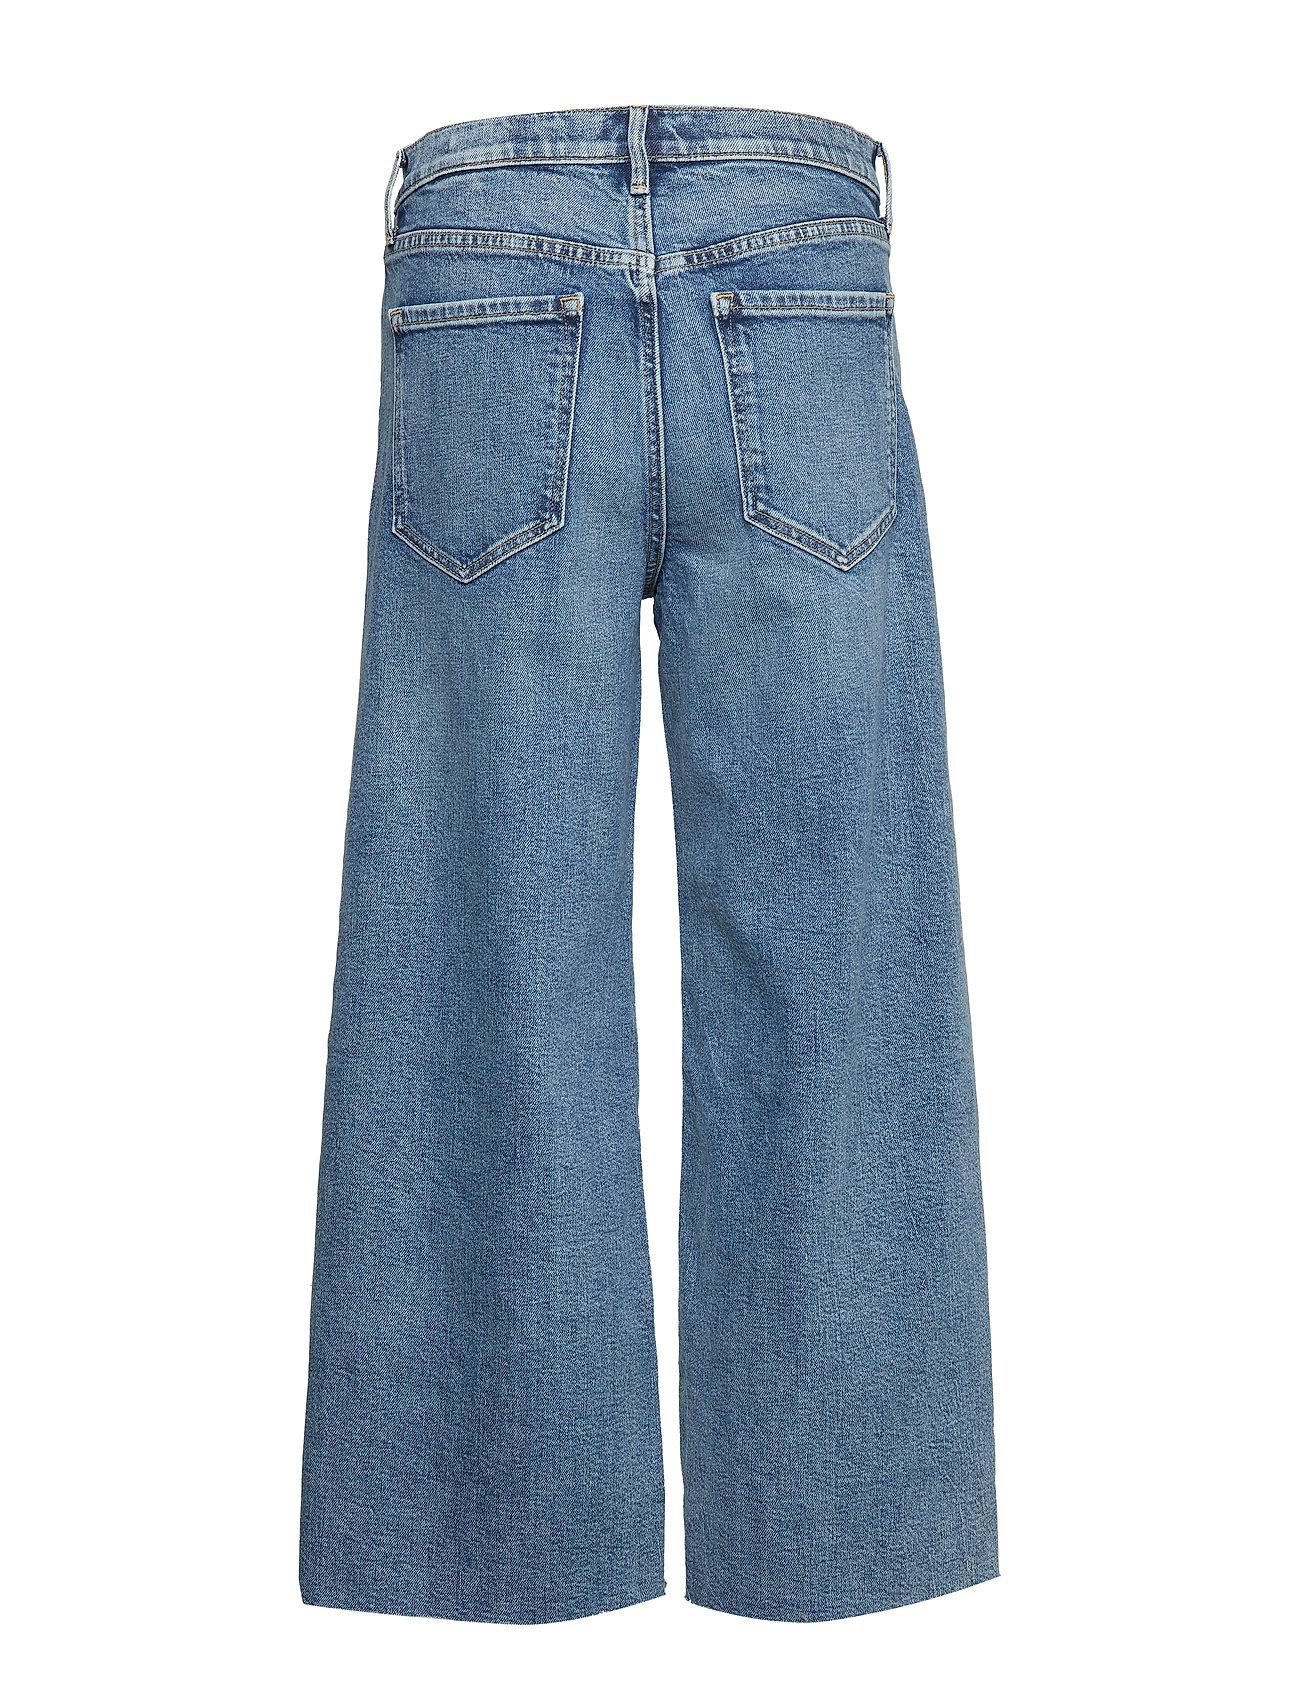 Banana Republic - High-Rise Wide-Leg Cropped Jean - broeken met wijde pijpen - medium blue vintage - 1